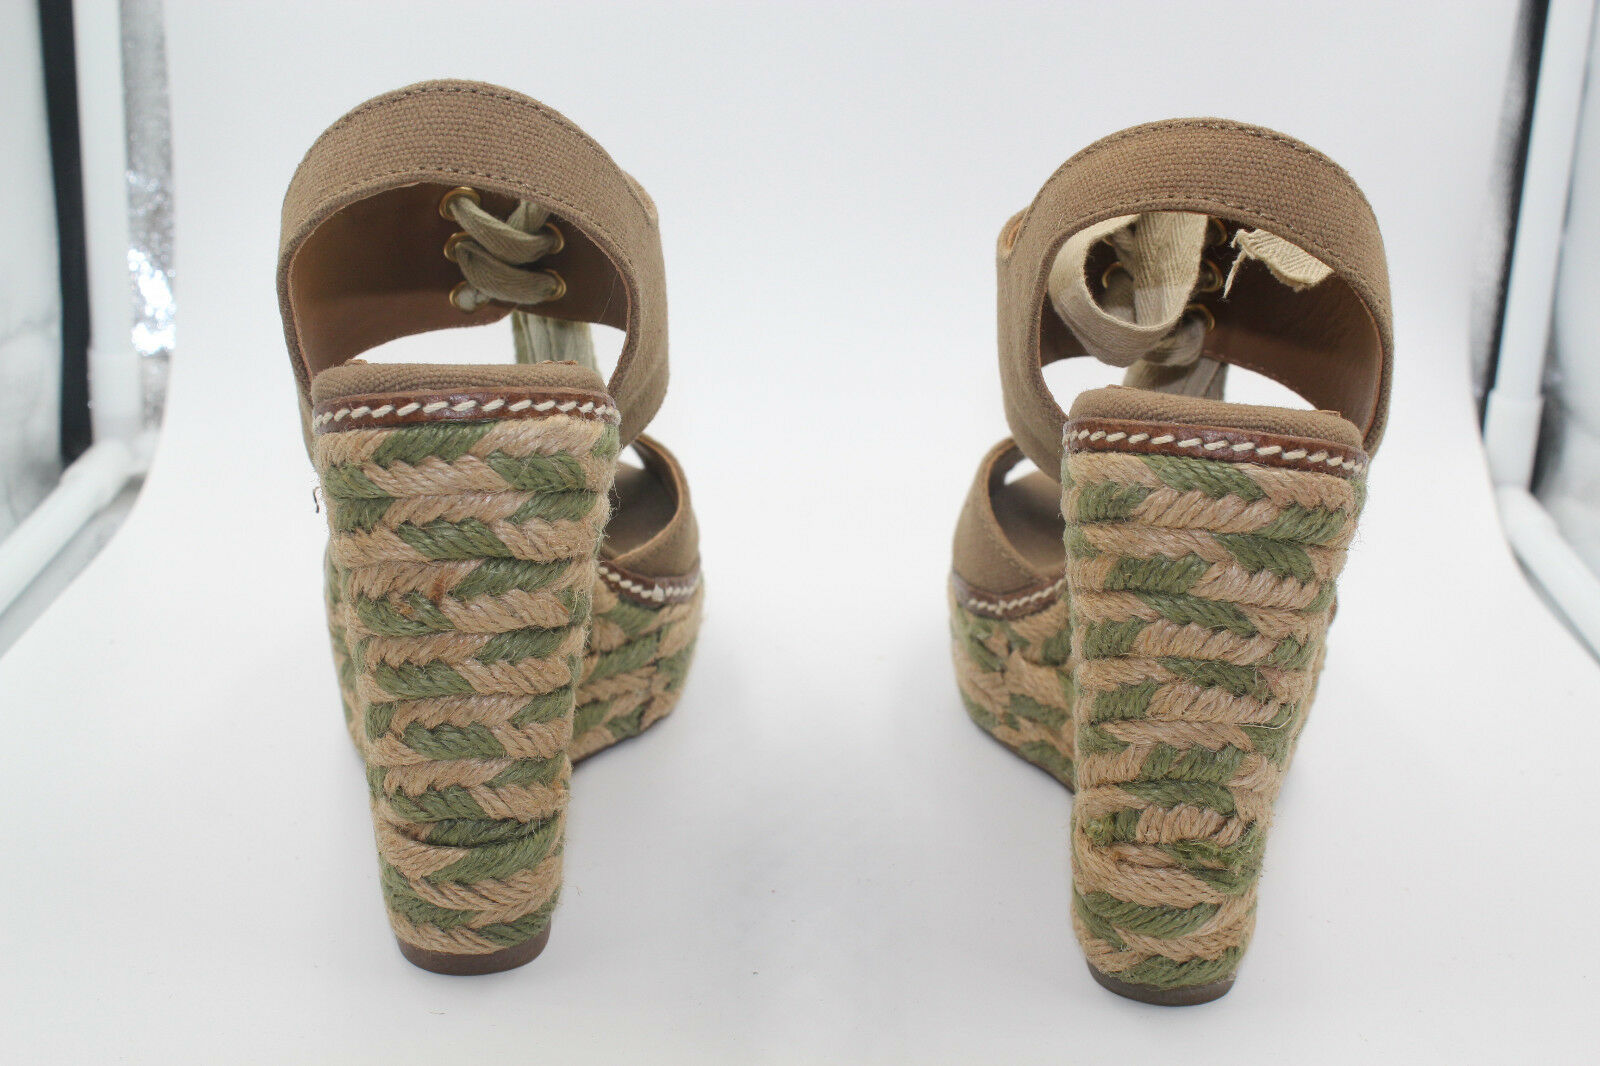 TORY WEDGE BURCH Schuhe 12128401 OLIVE 346 LINLEY HIGH WEDGE TORY ESPADRILLE SIZE 5 38e146